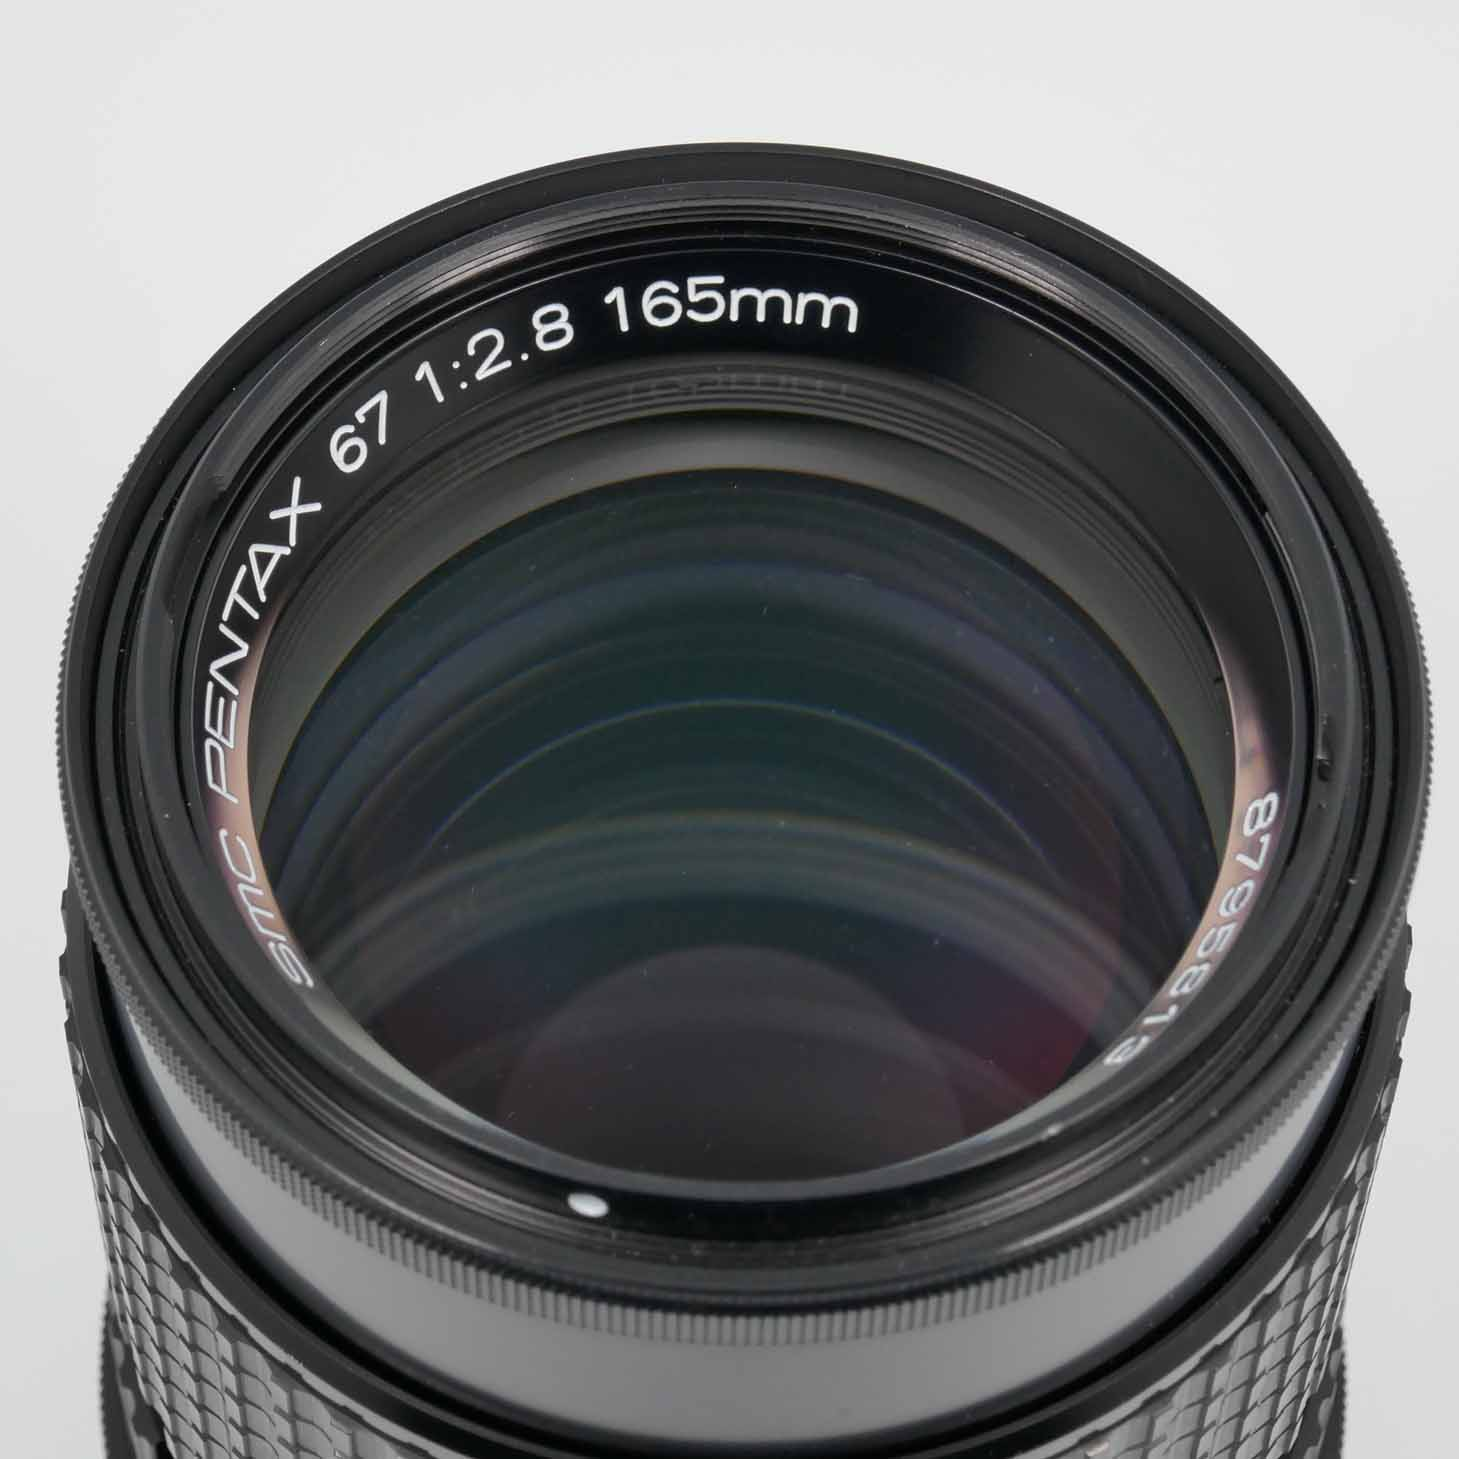 clean-cameras-Pentax-67-165mm-2.8-06